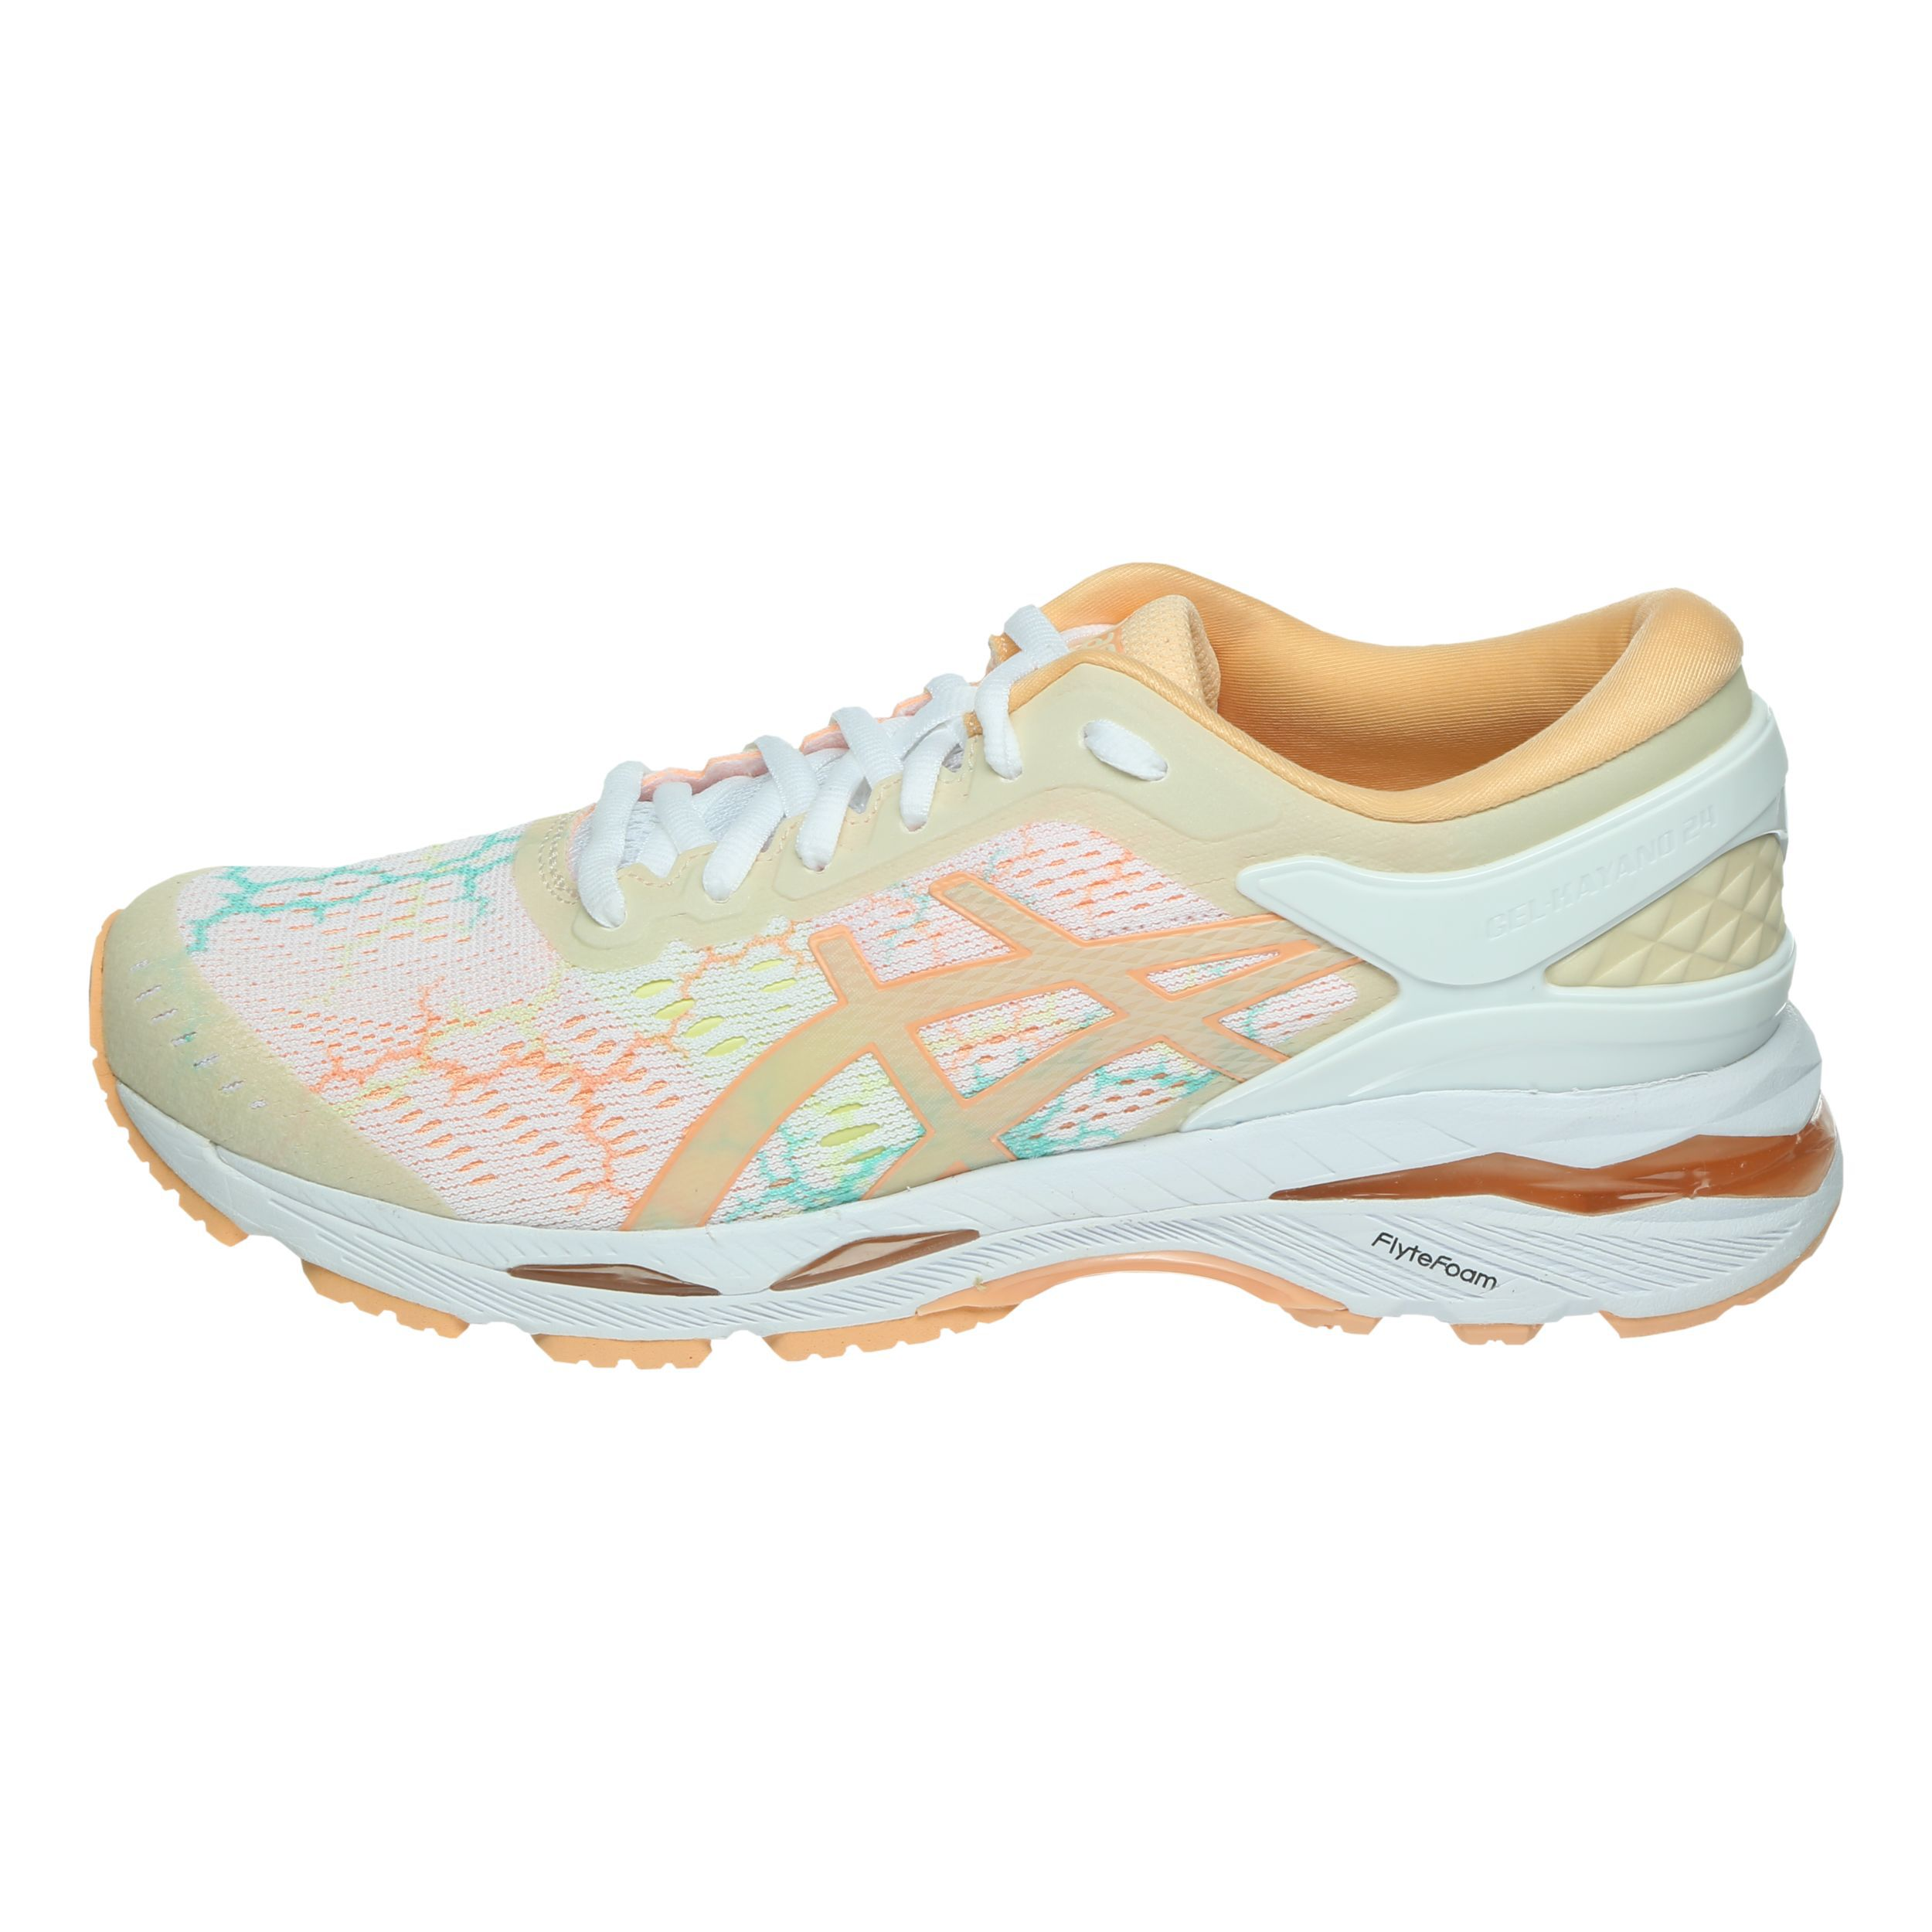 buy Asics Gel-Kayano 24 Lite-Show Stability Running Shoe ...